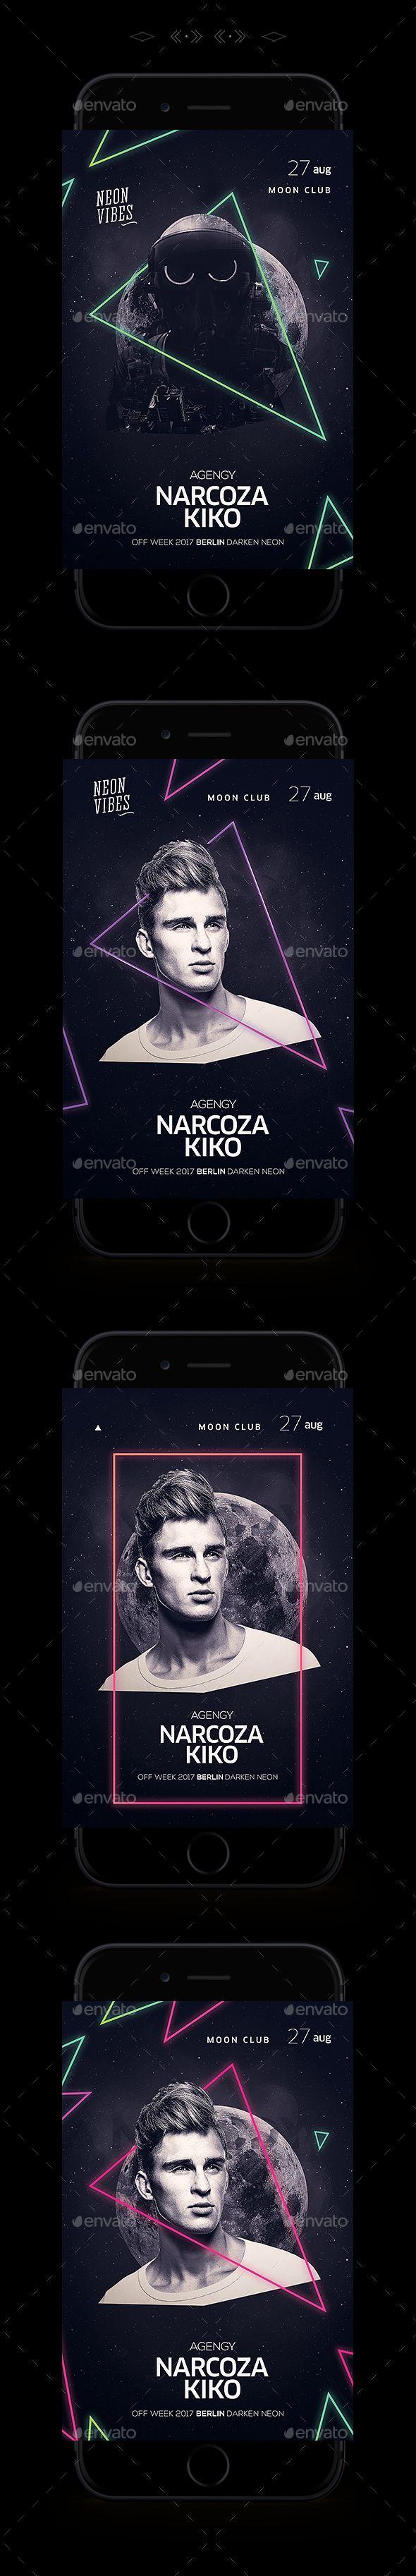 Neon Flyer — Photoshop PSD #8.847x12.957 #light • Download ➝ https://graphicriver.net/item/neon-flyer/19457841?ref=pxcr